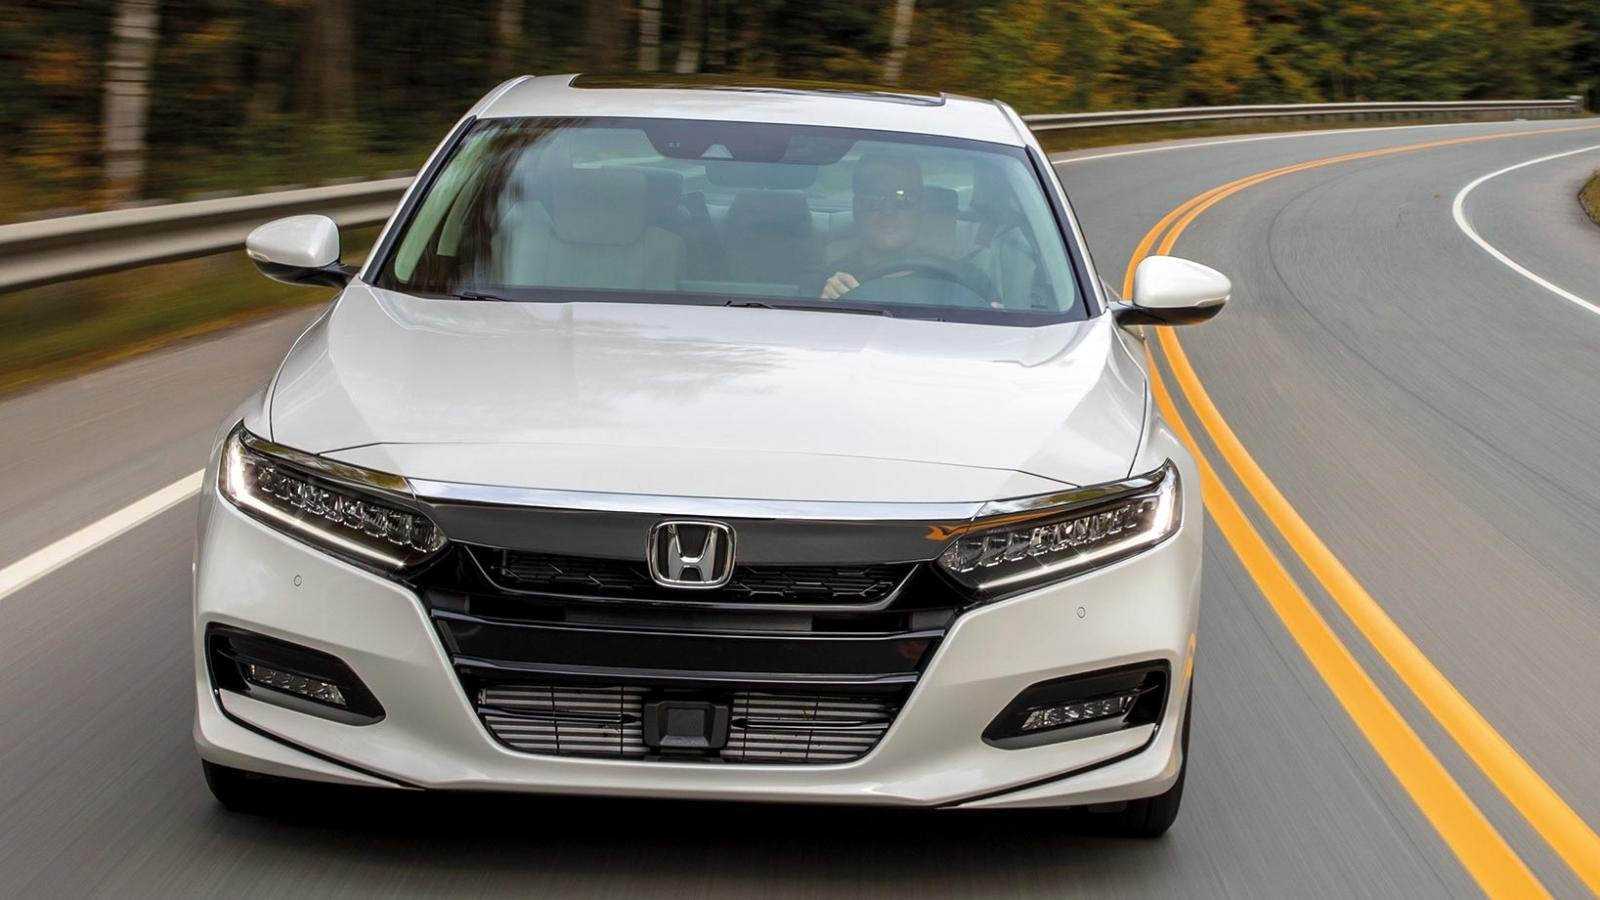 El Honda Accord tiene motor turbo